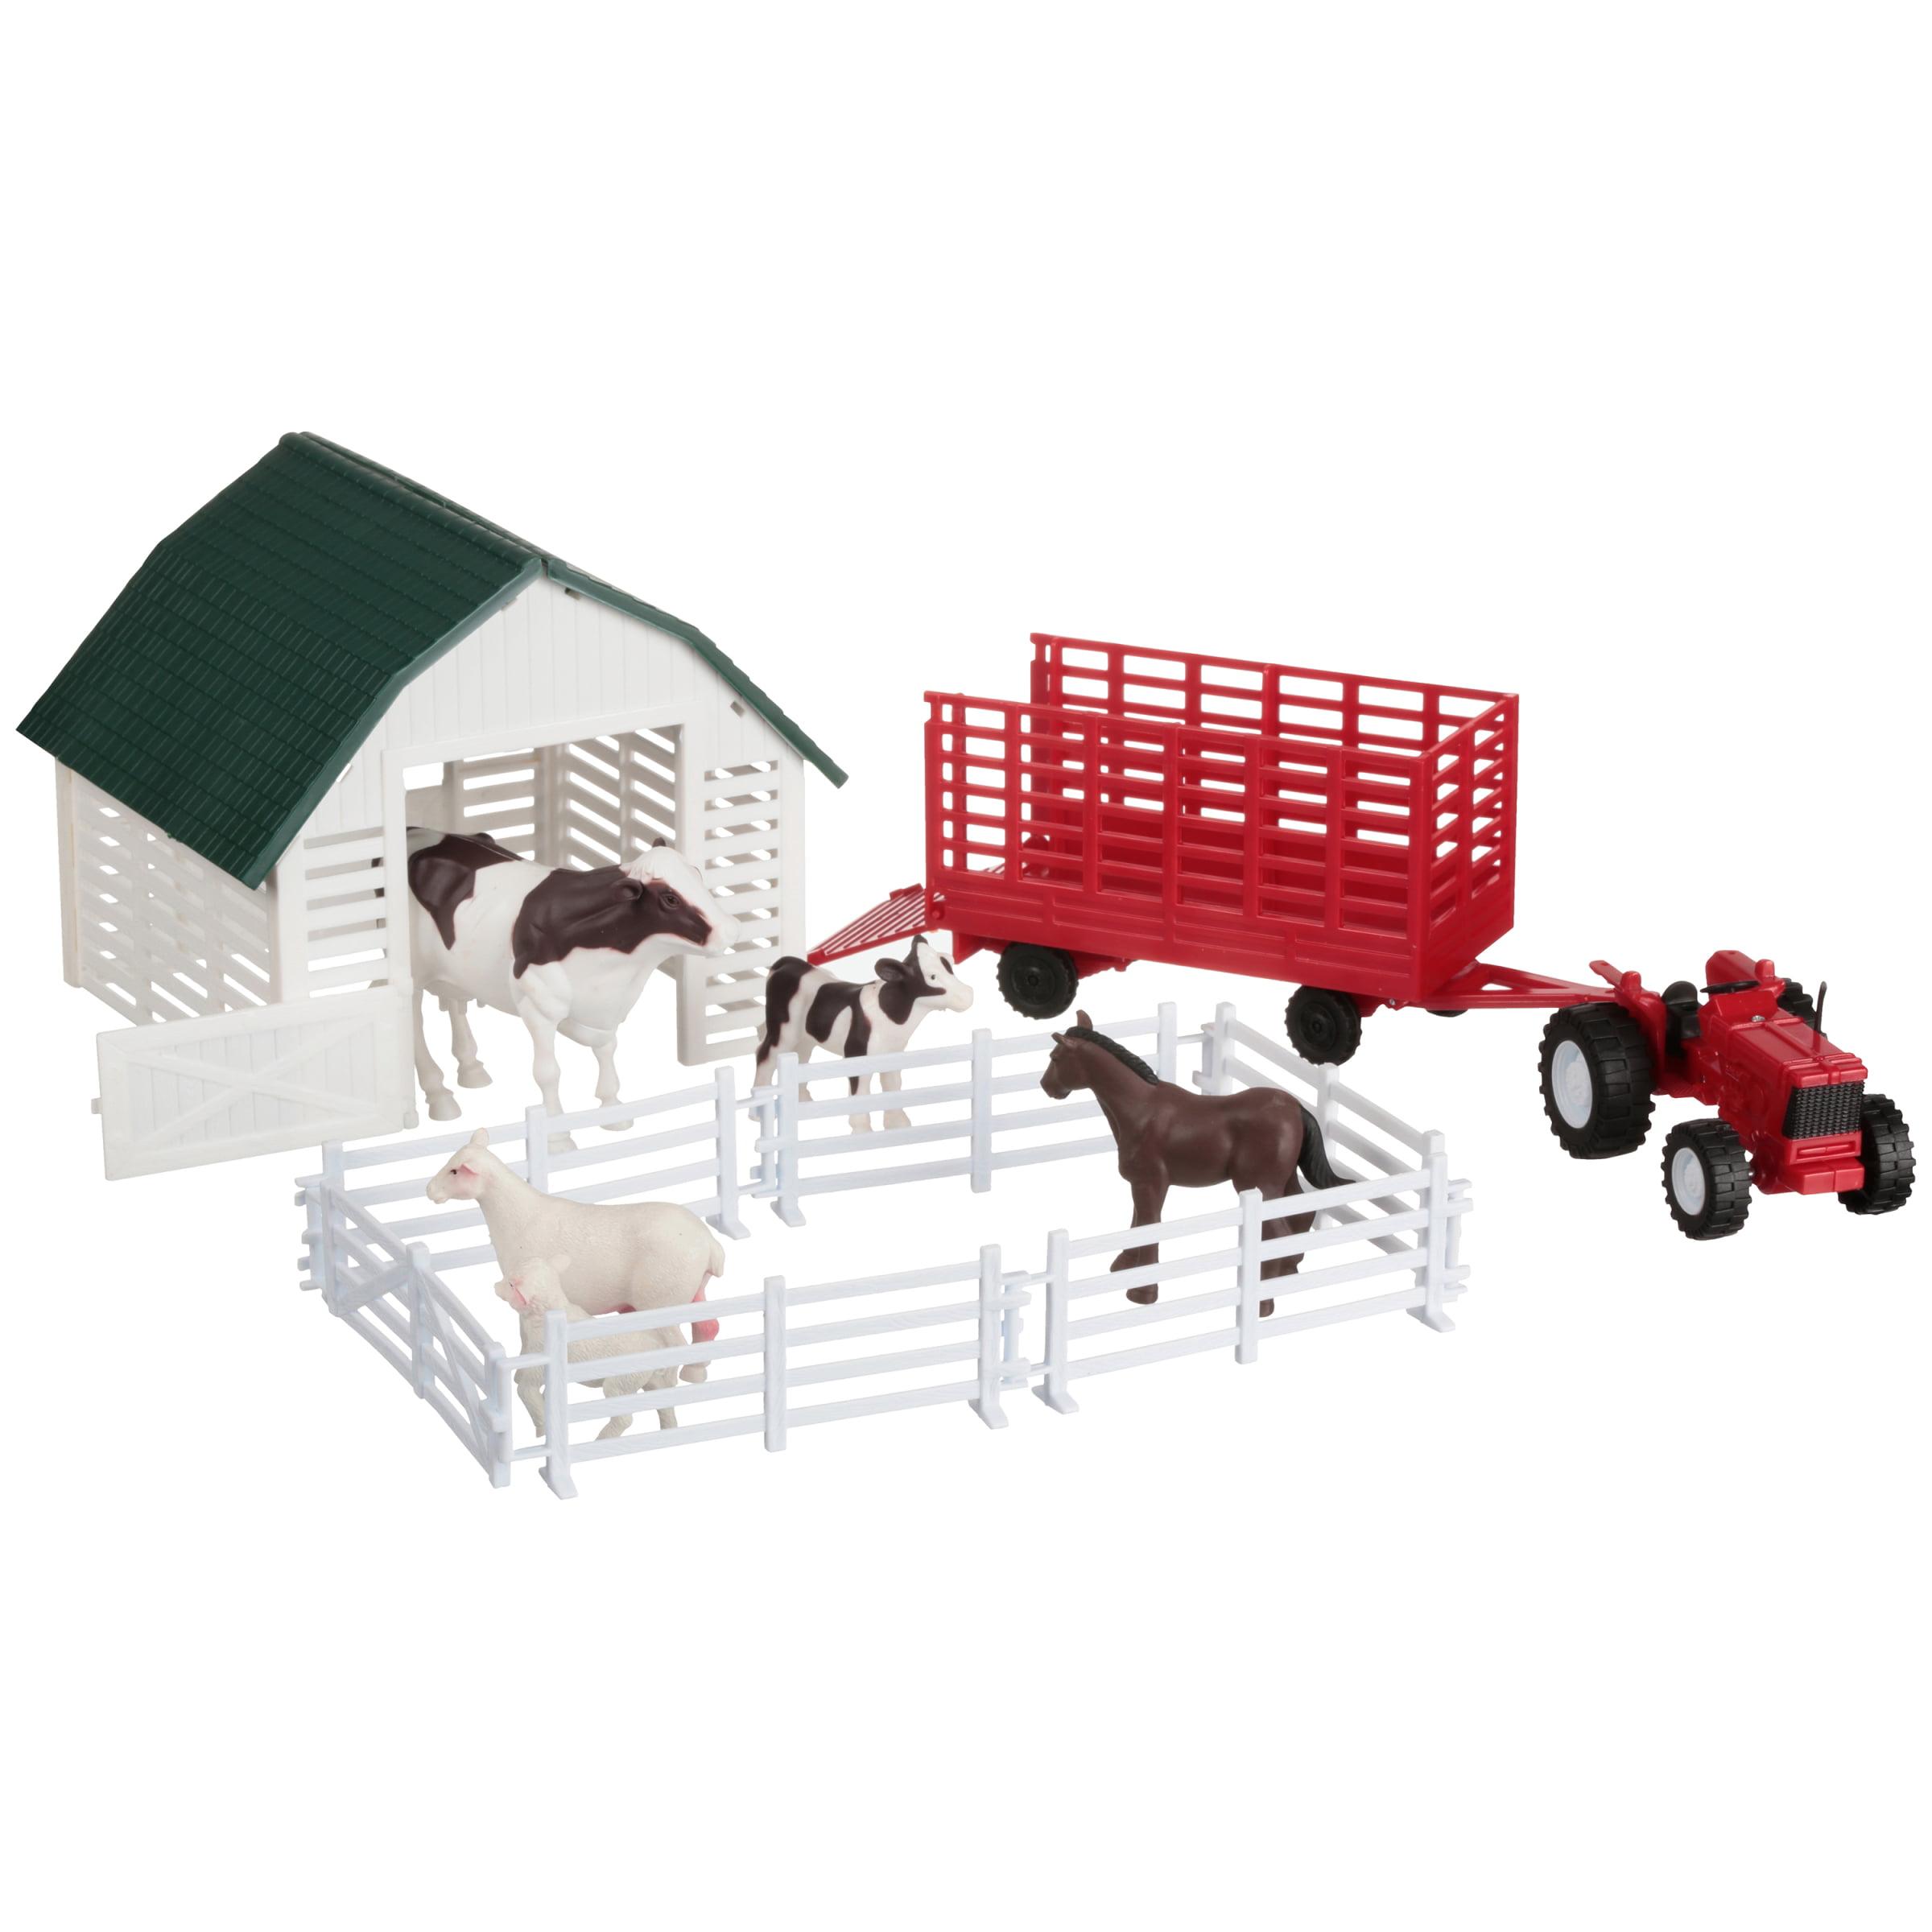 NewRay Country Life Farm Animals & Accessories 9 pc Box by New-Ray Toys Company Limited